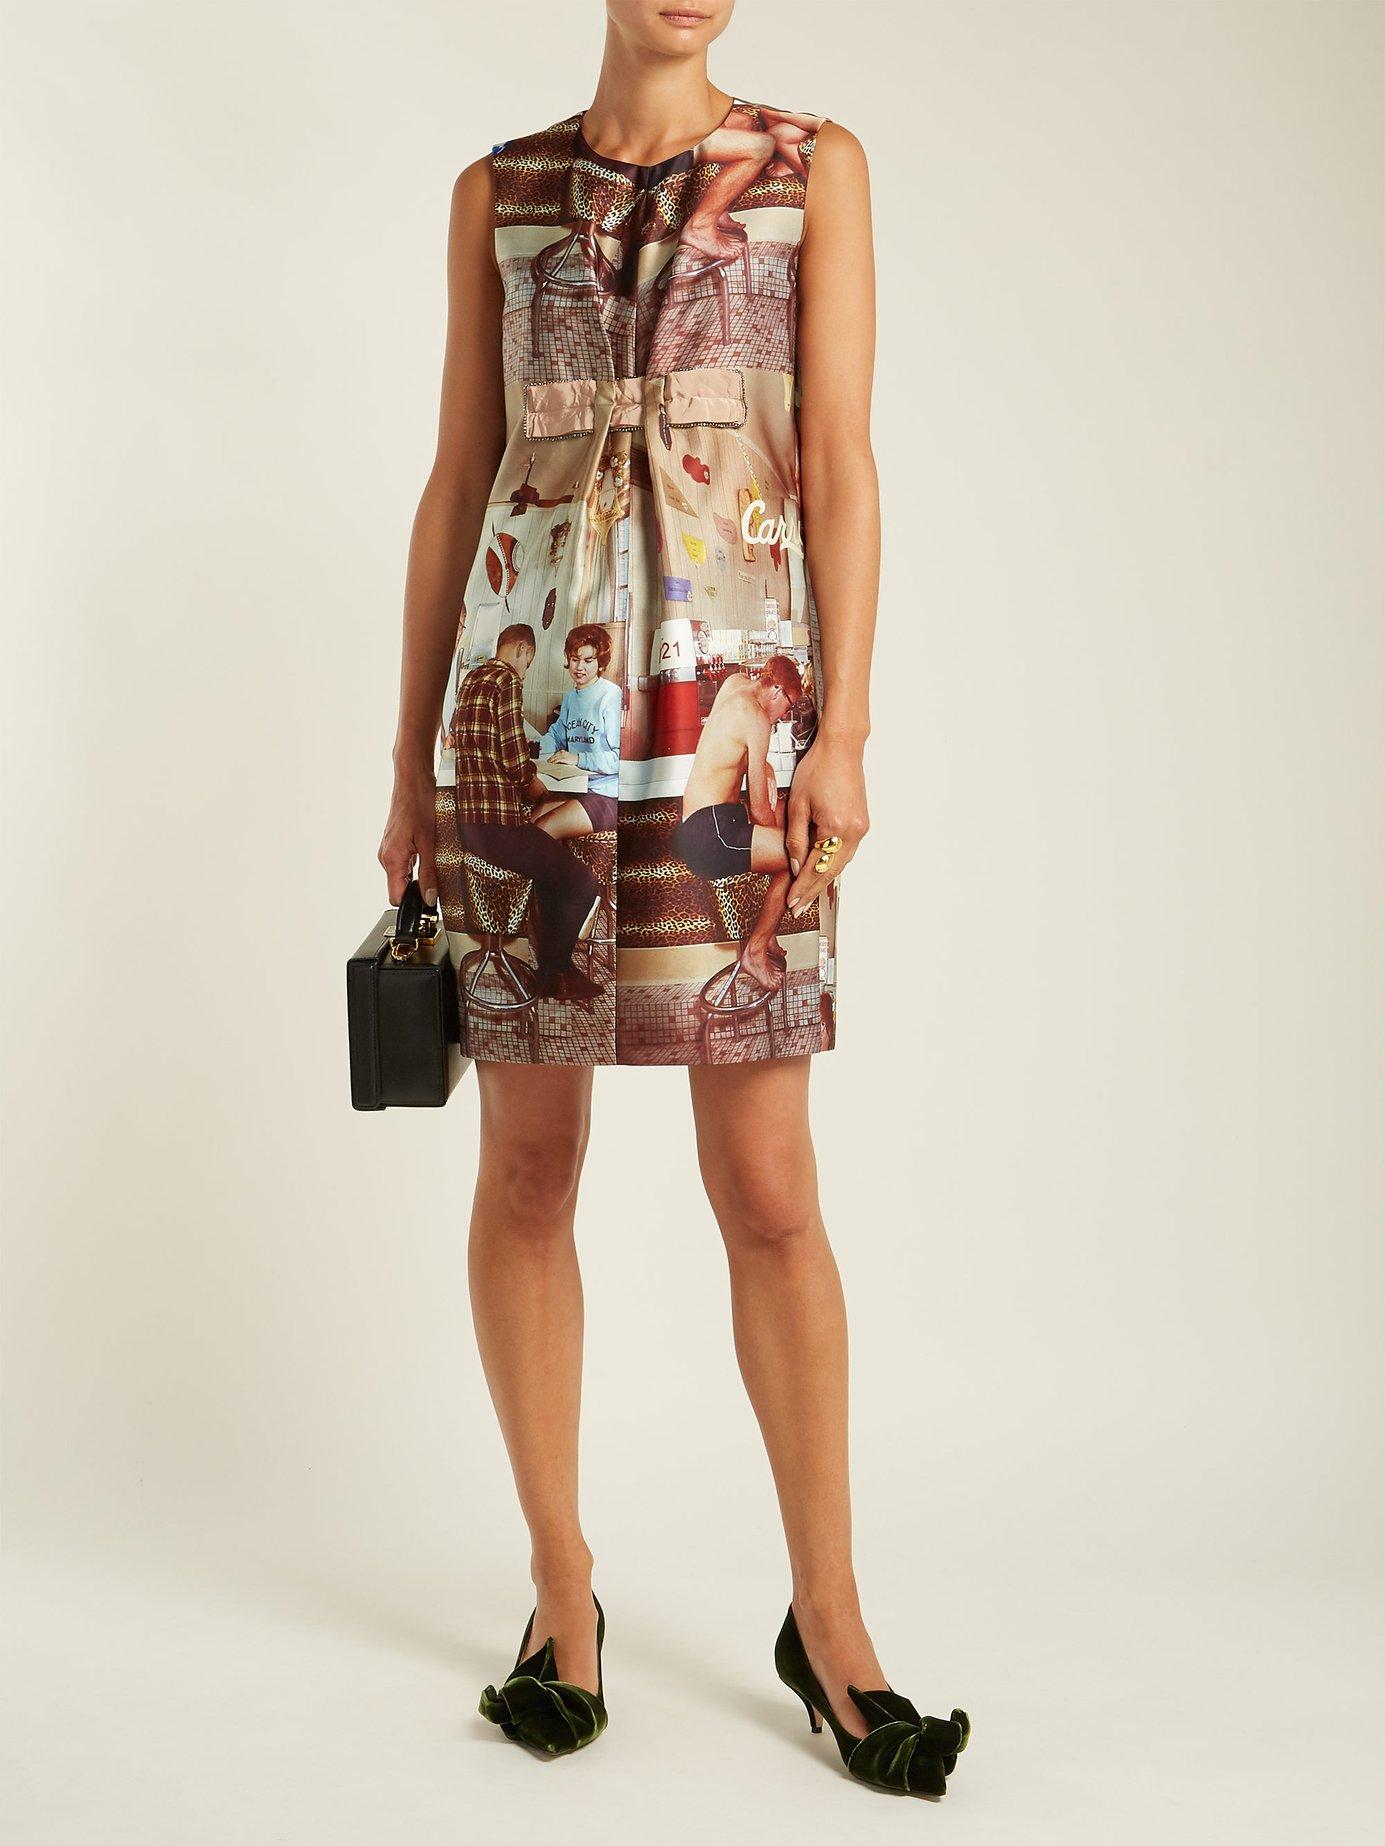 Printed sleeveless dress by No. 21